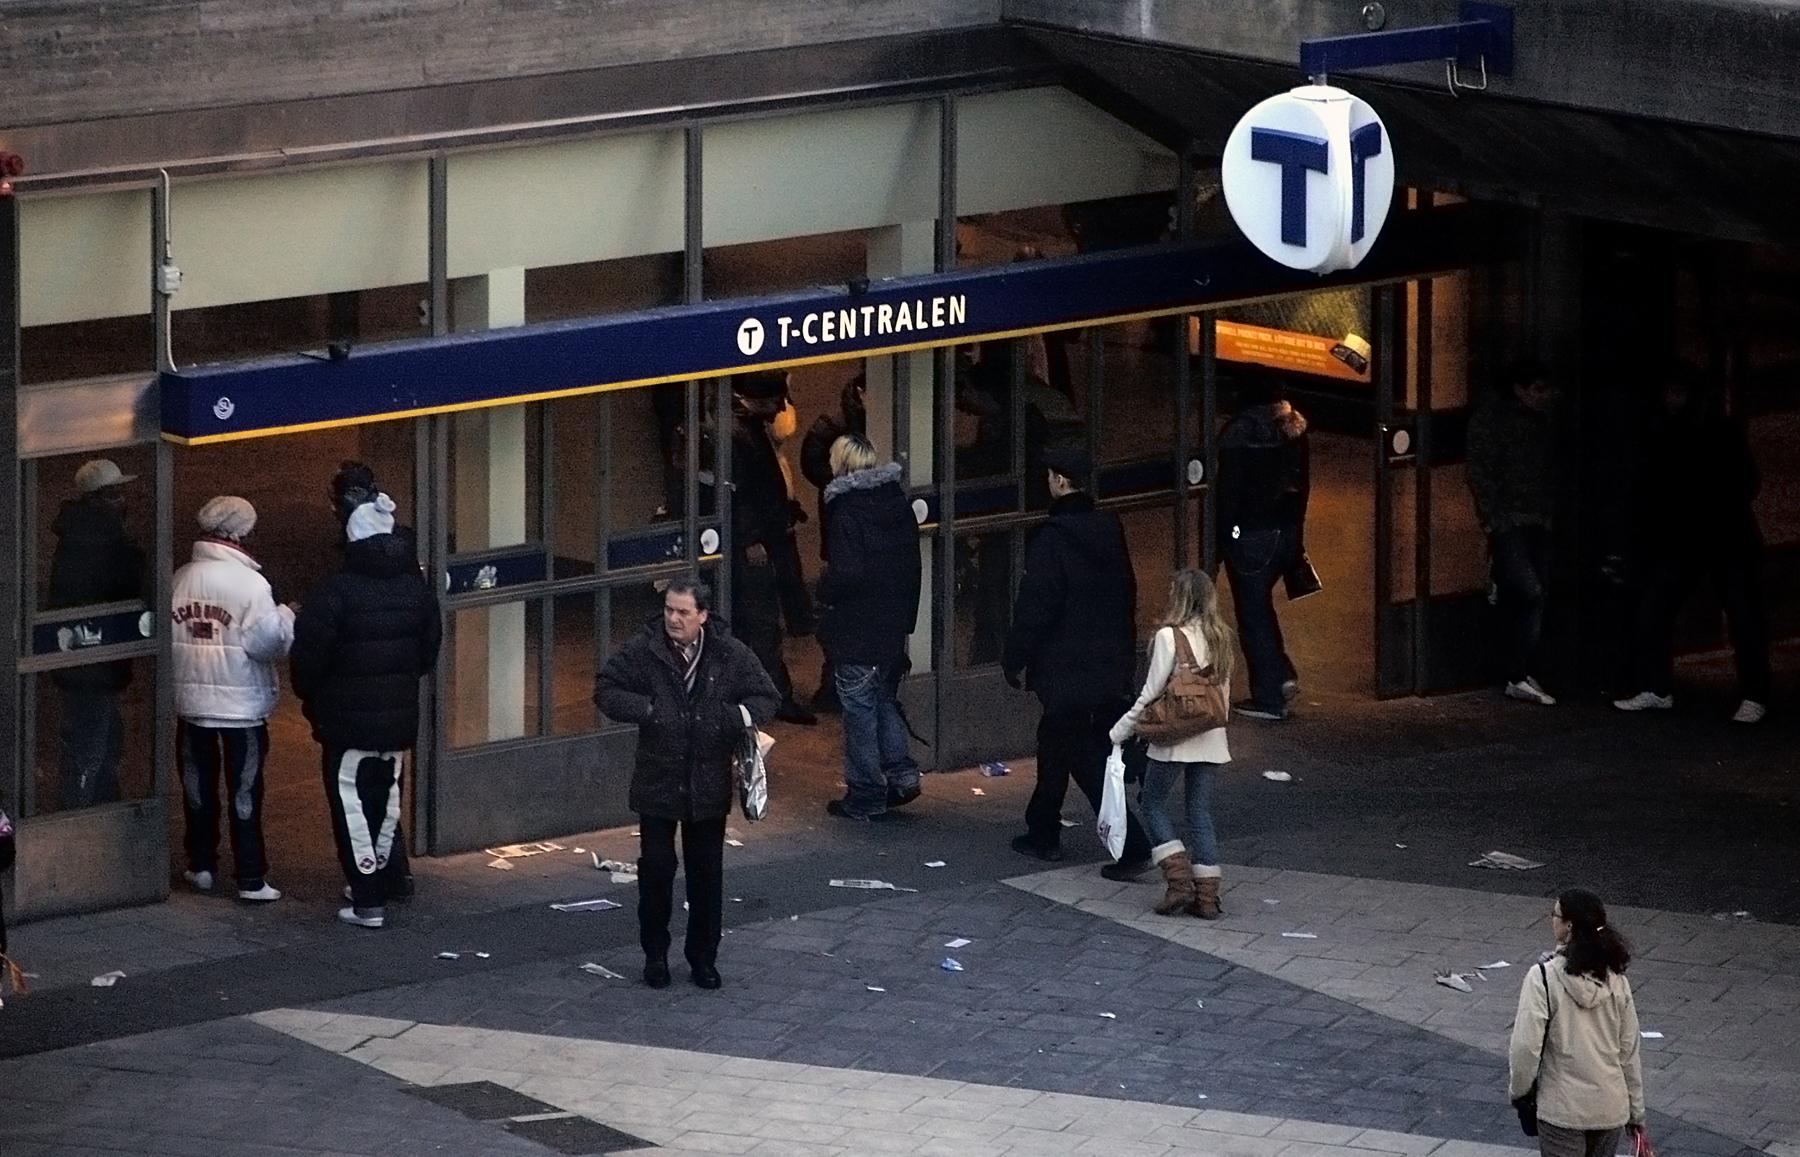 Вход на станцию метро T-centralen